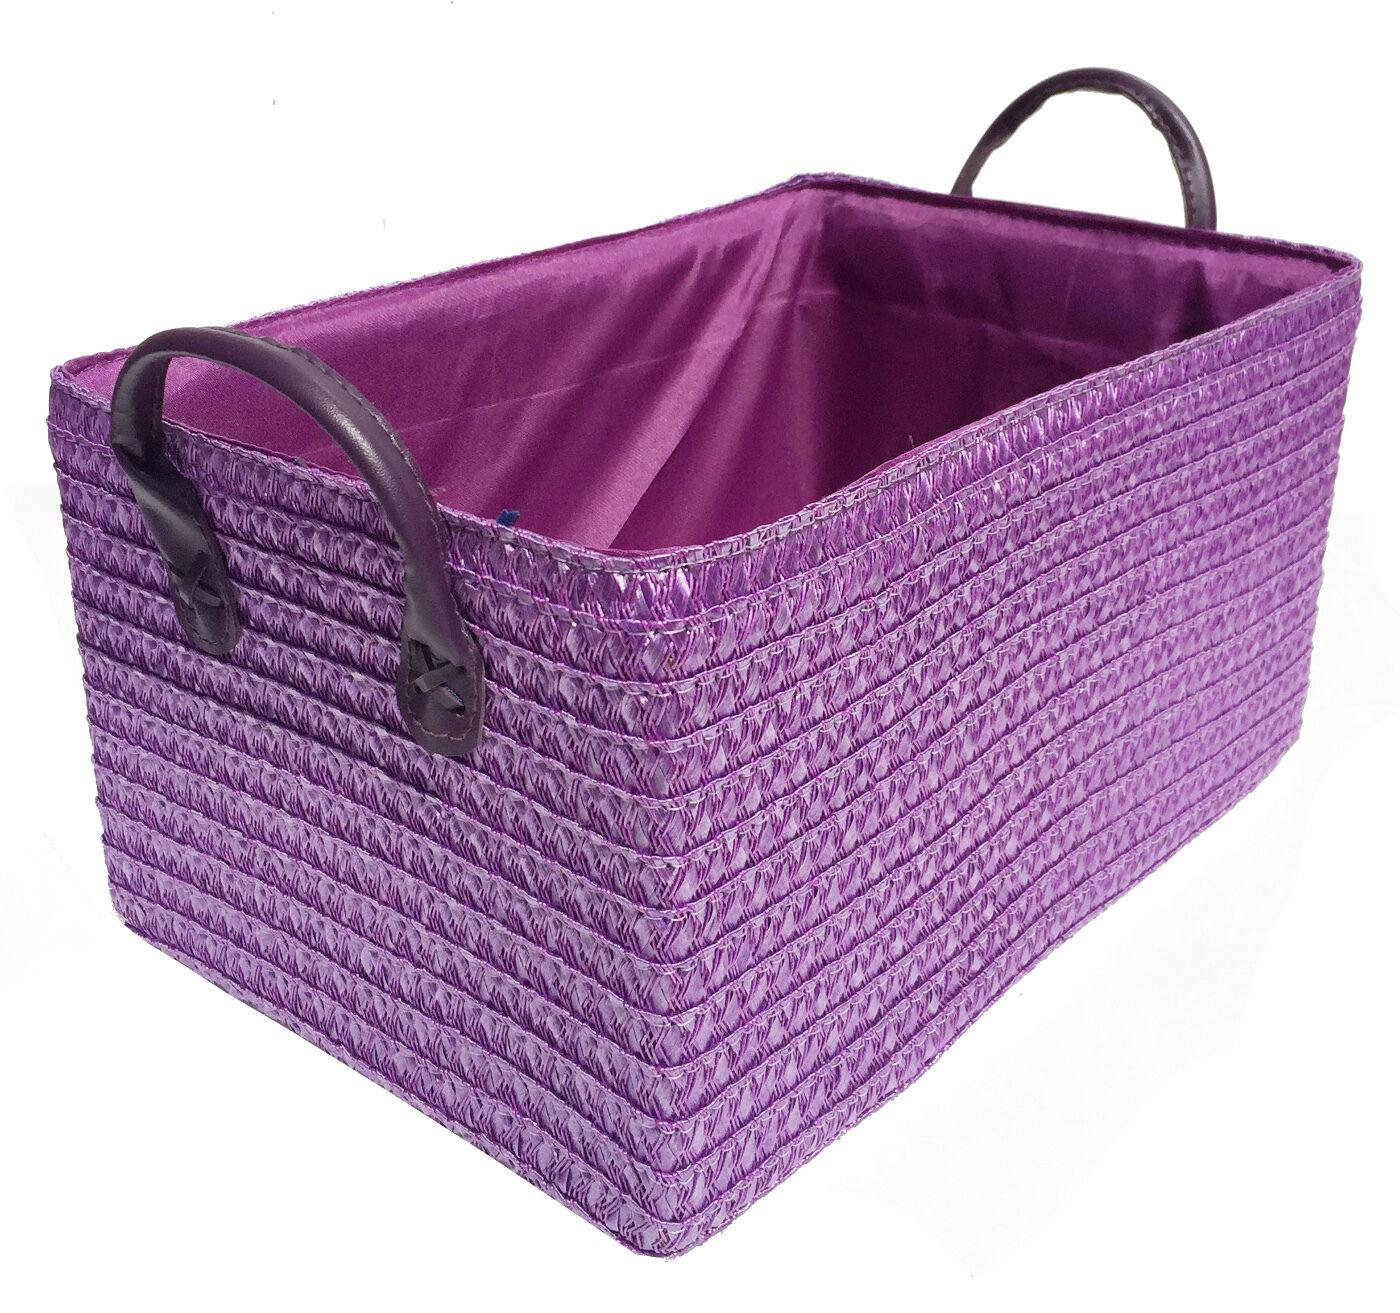 Neón púrpura brillante Juguetes ARMARIO ARMARIO ARMARIO COCINA CESTA ALMACENAJE + Manija 0979a7